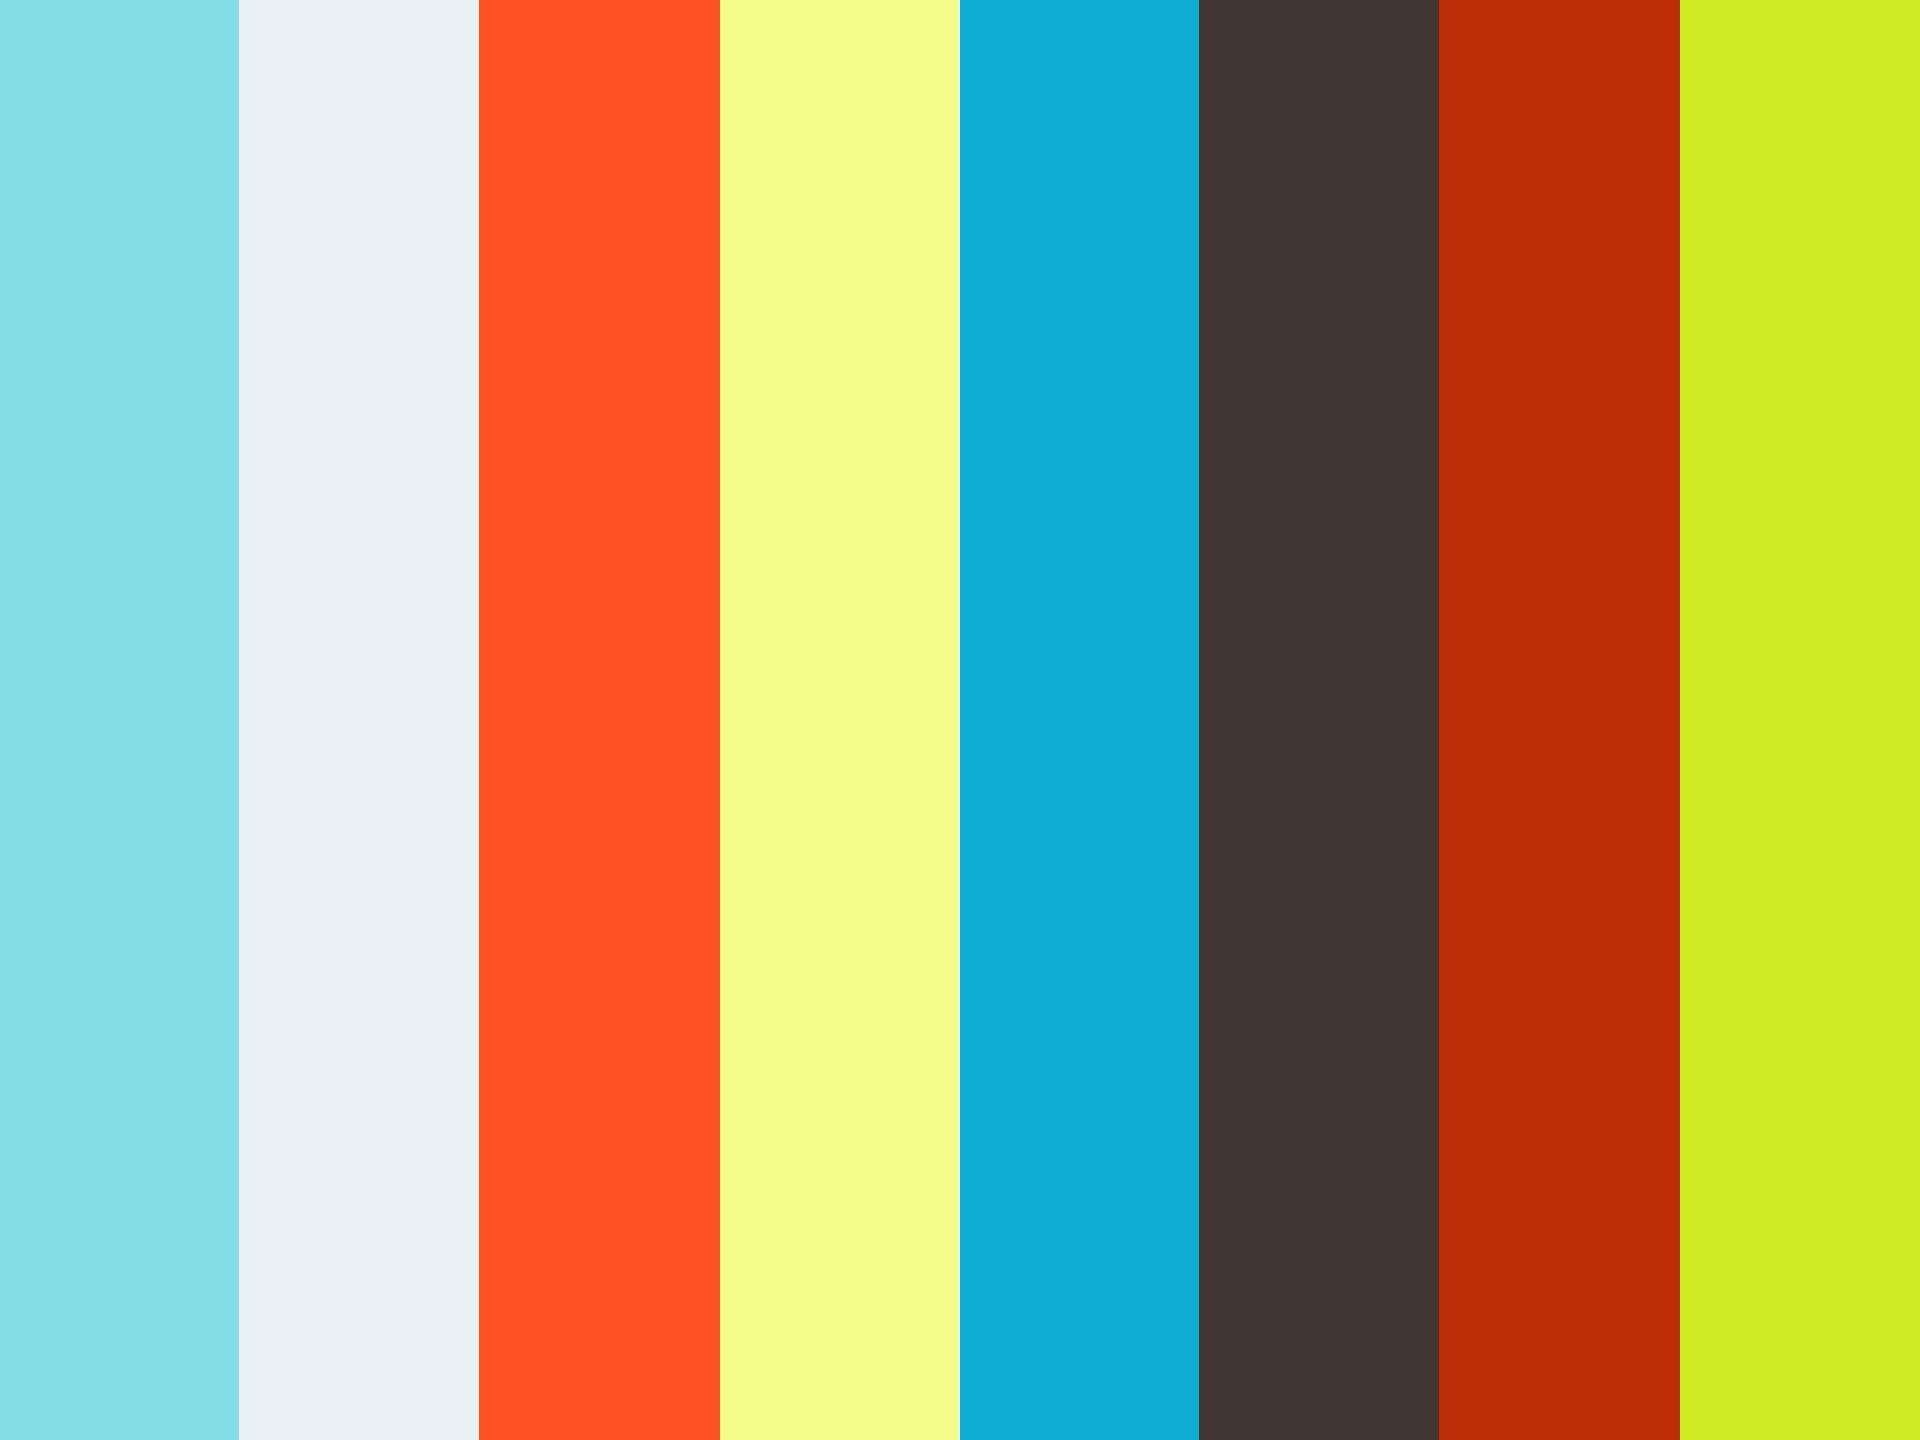 AUDI A4 - BLACK - 2015